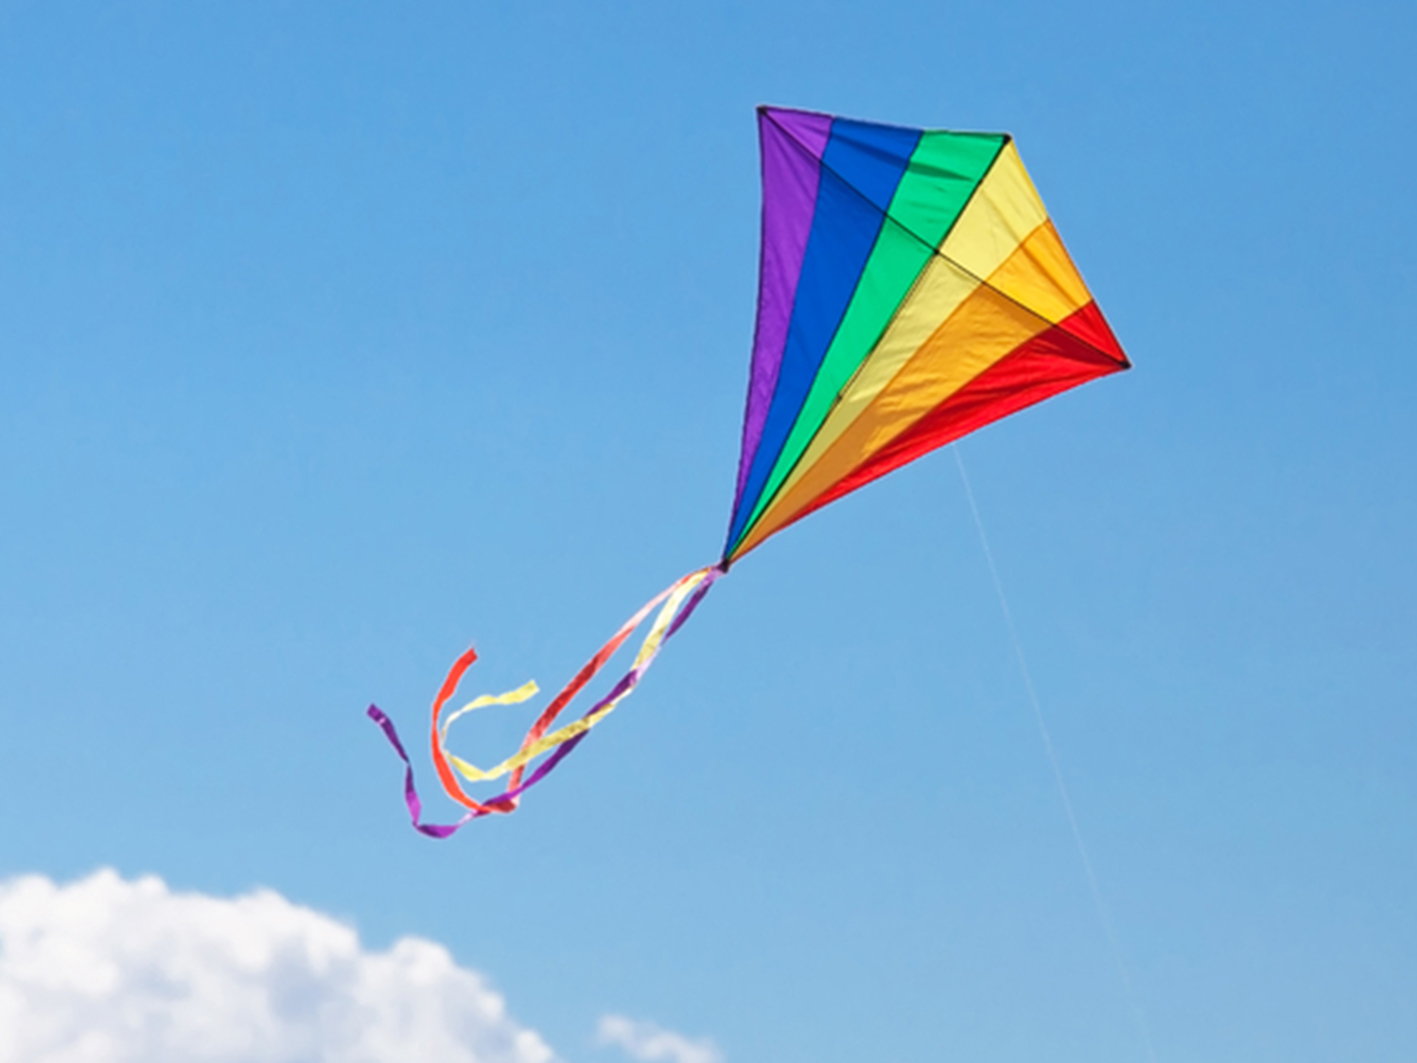 Kite HD wallpapers, Desktop wallpaper - most viewed